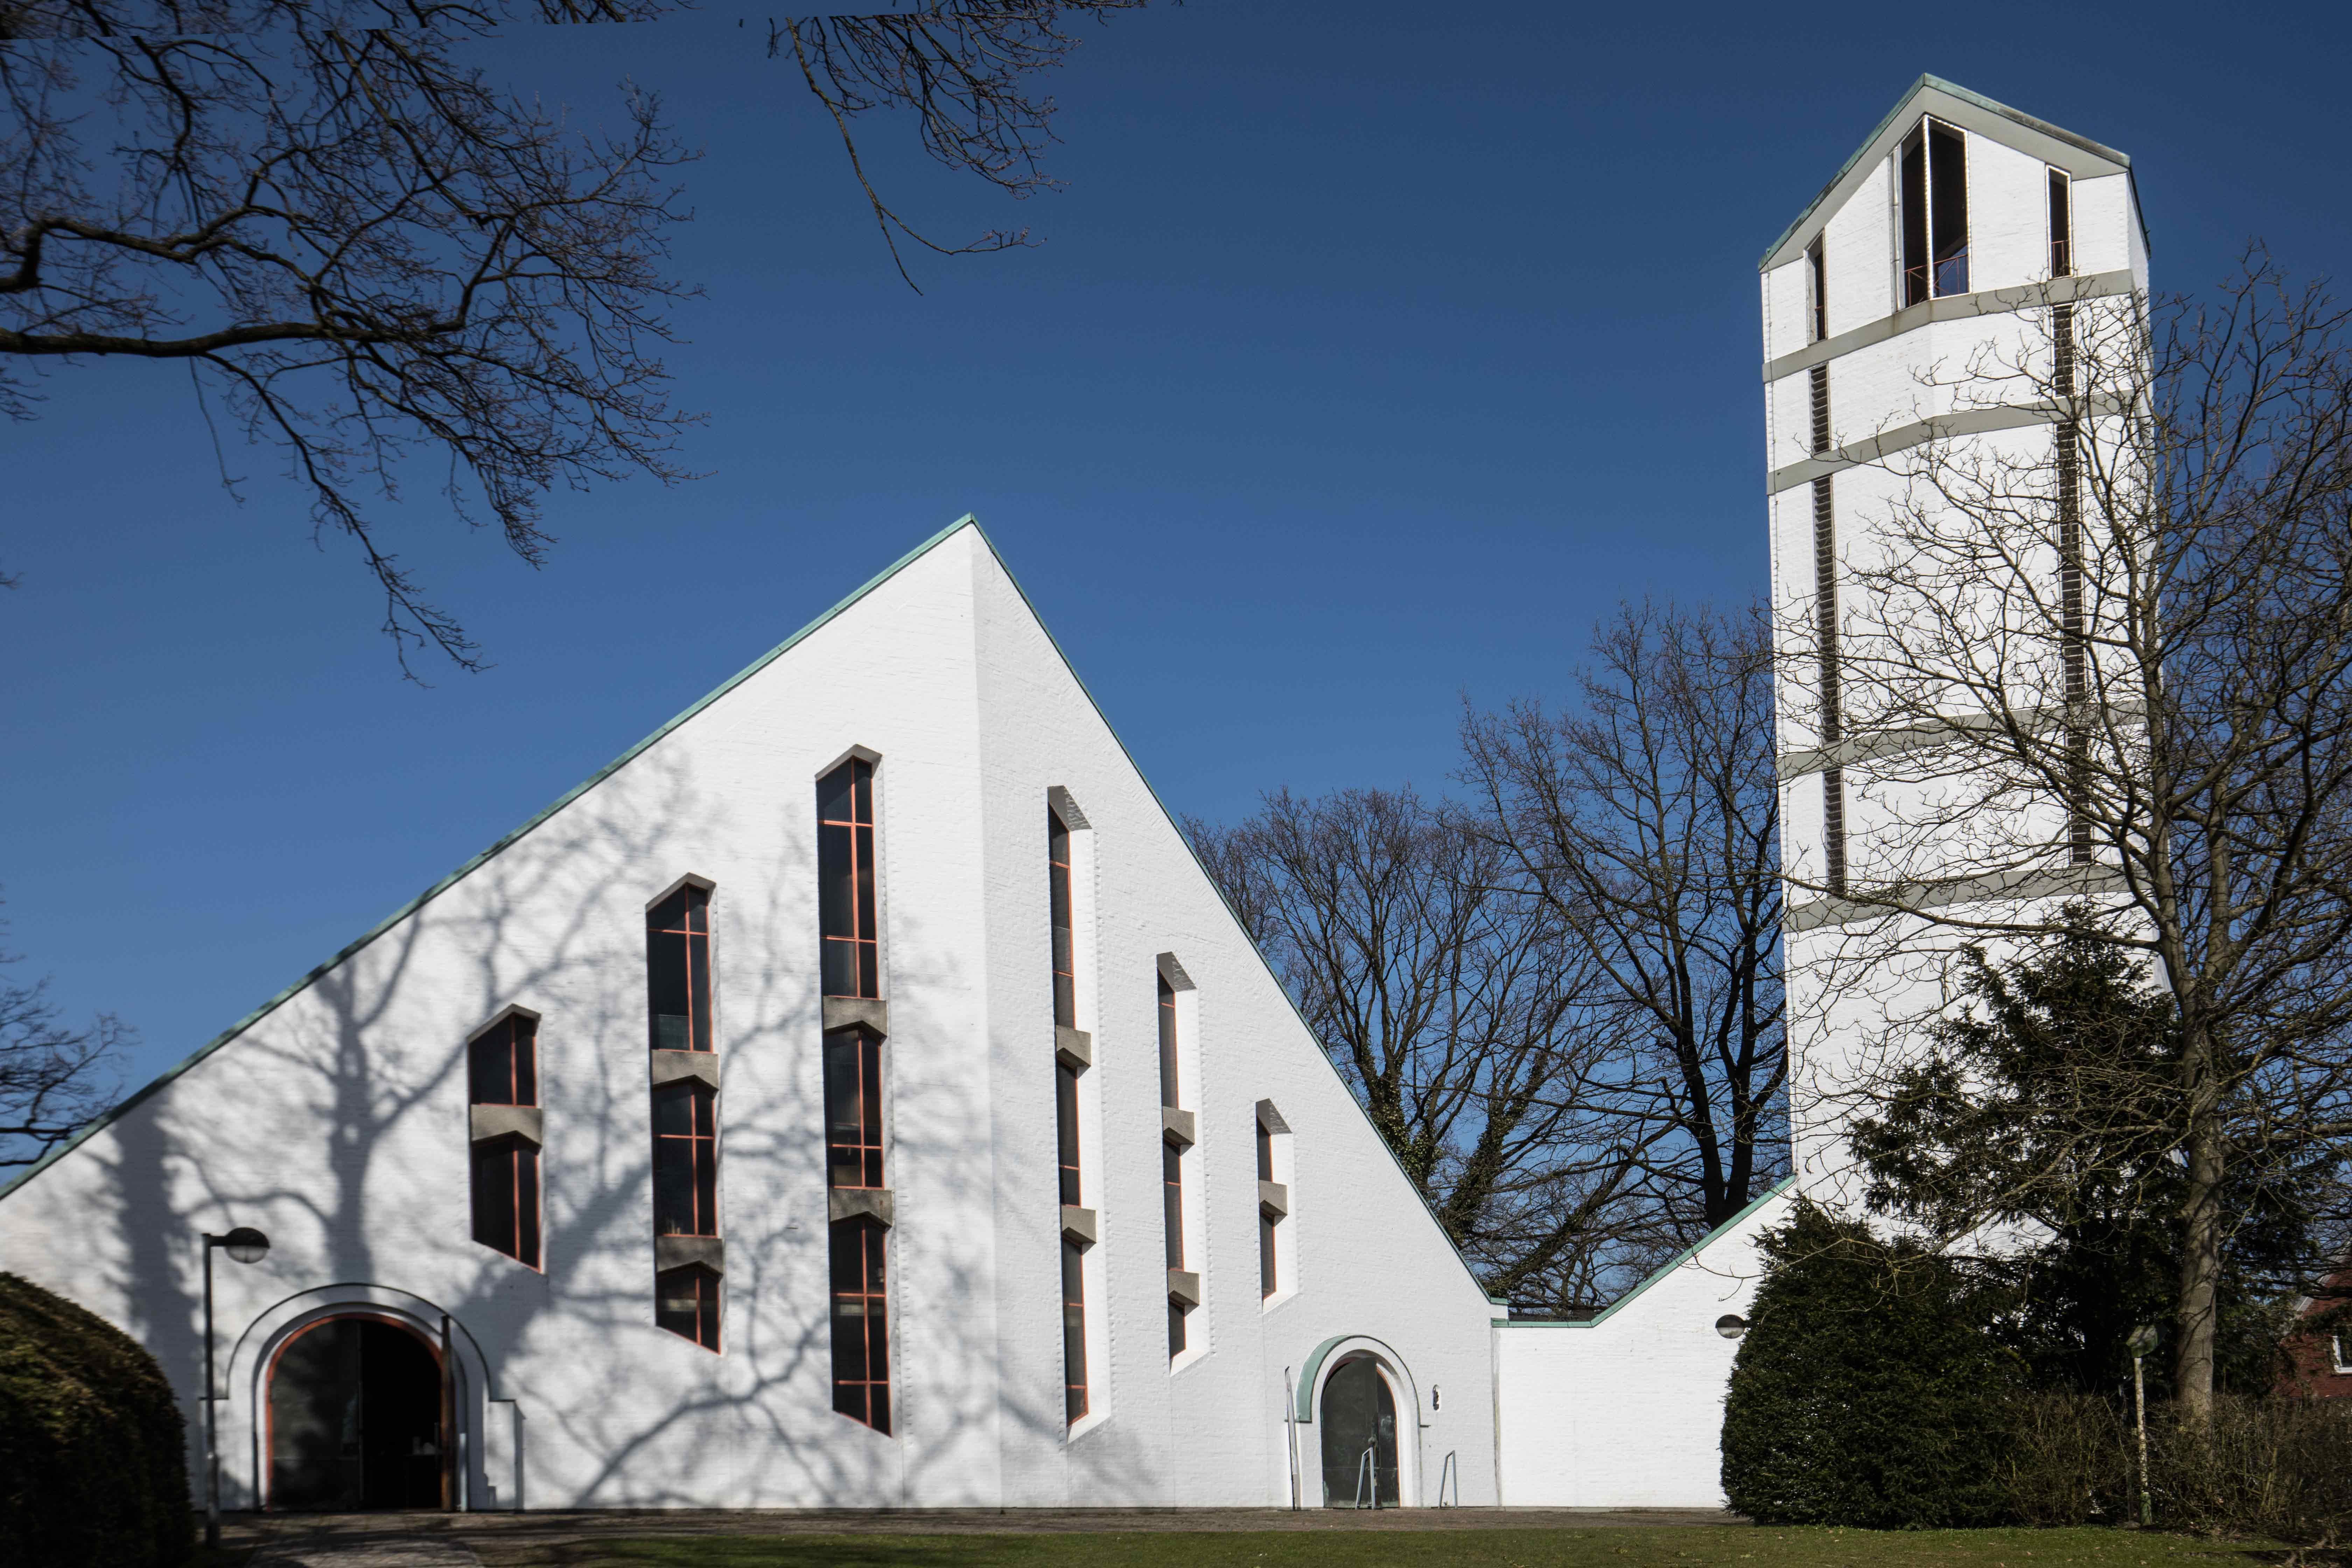 Martinskirche Rahlstedt